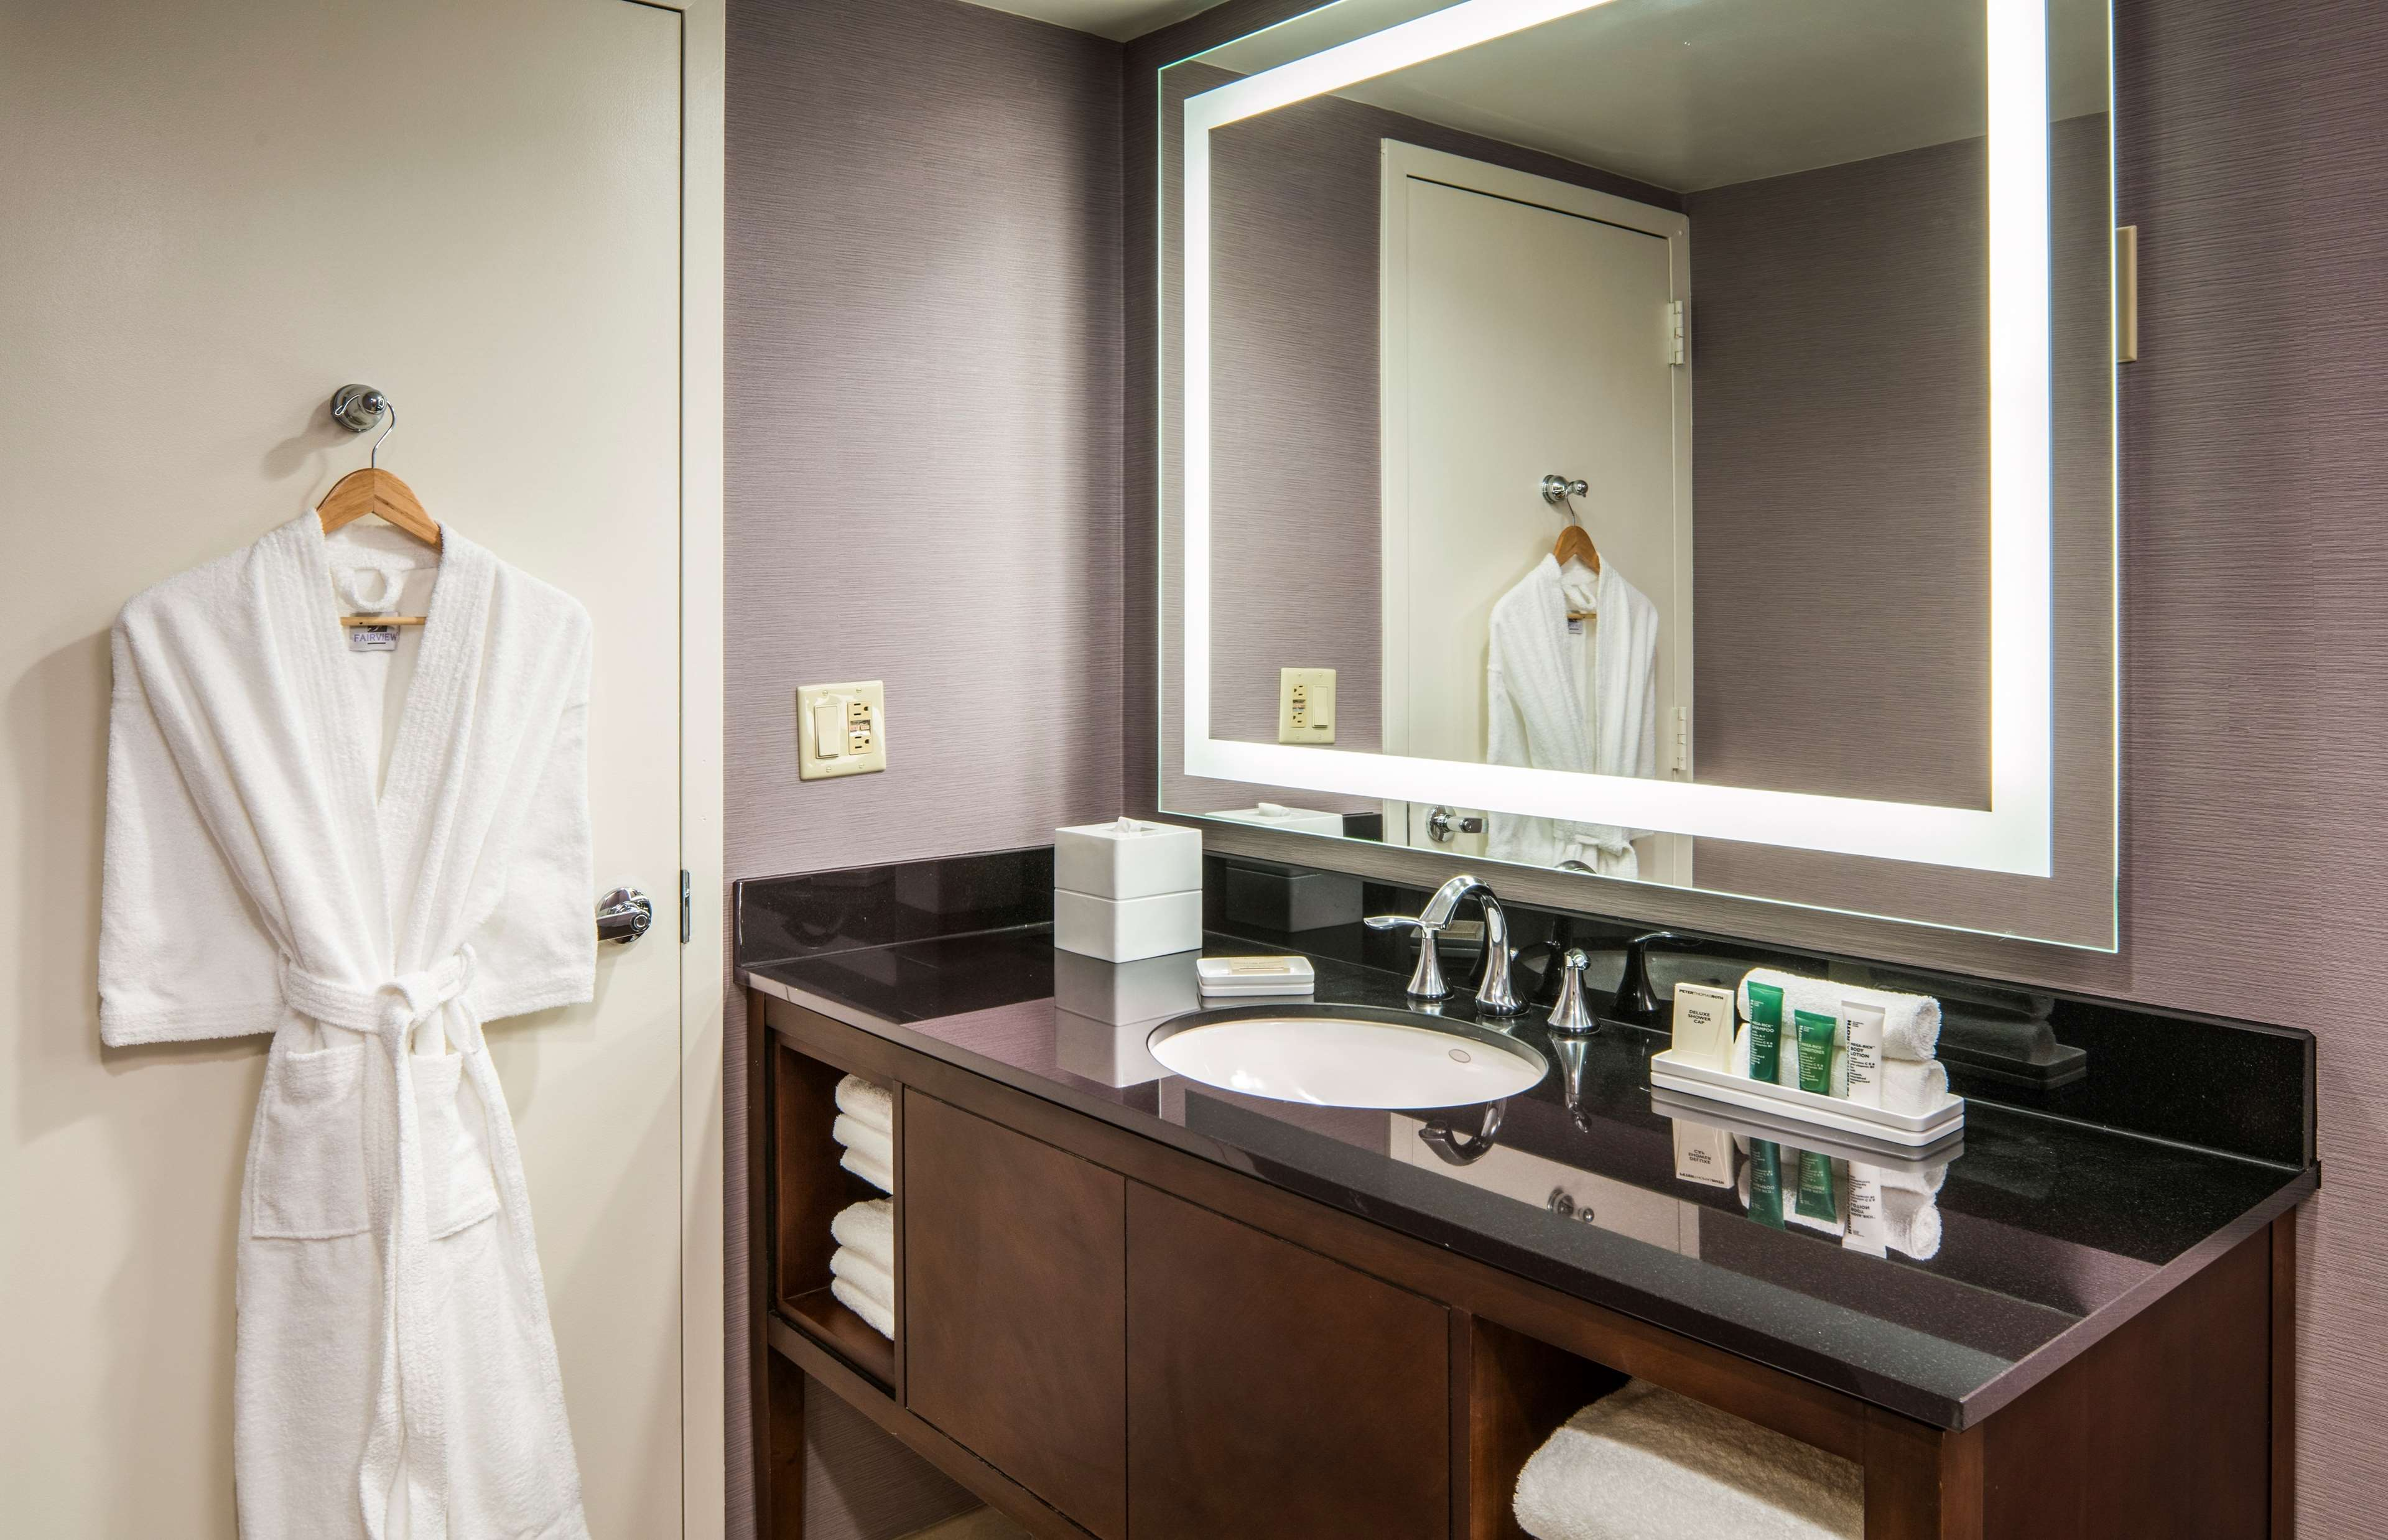 Hilton Washington DC/Rockville Hotel & Executive Meeting Ctr image 42